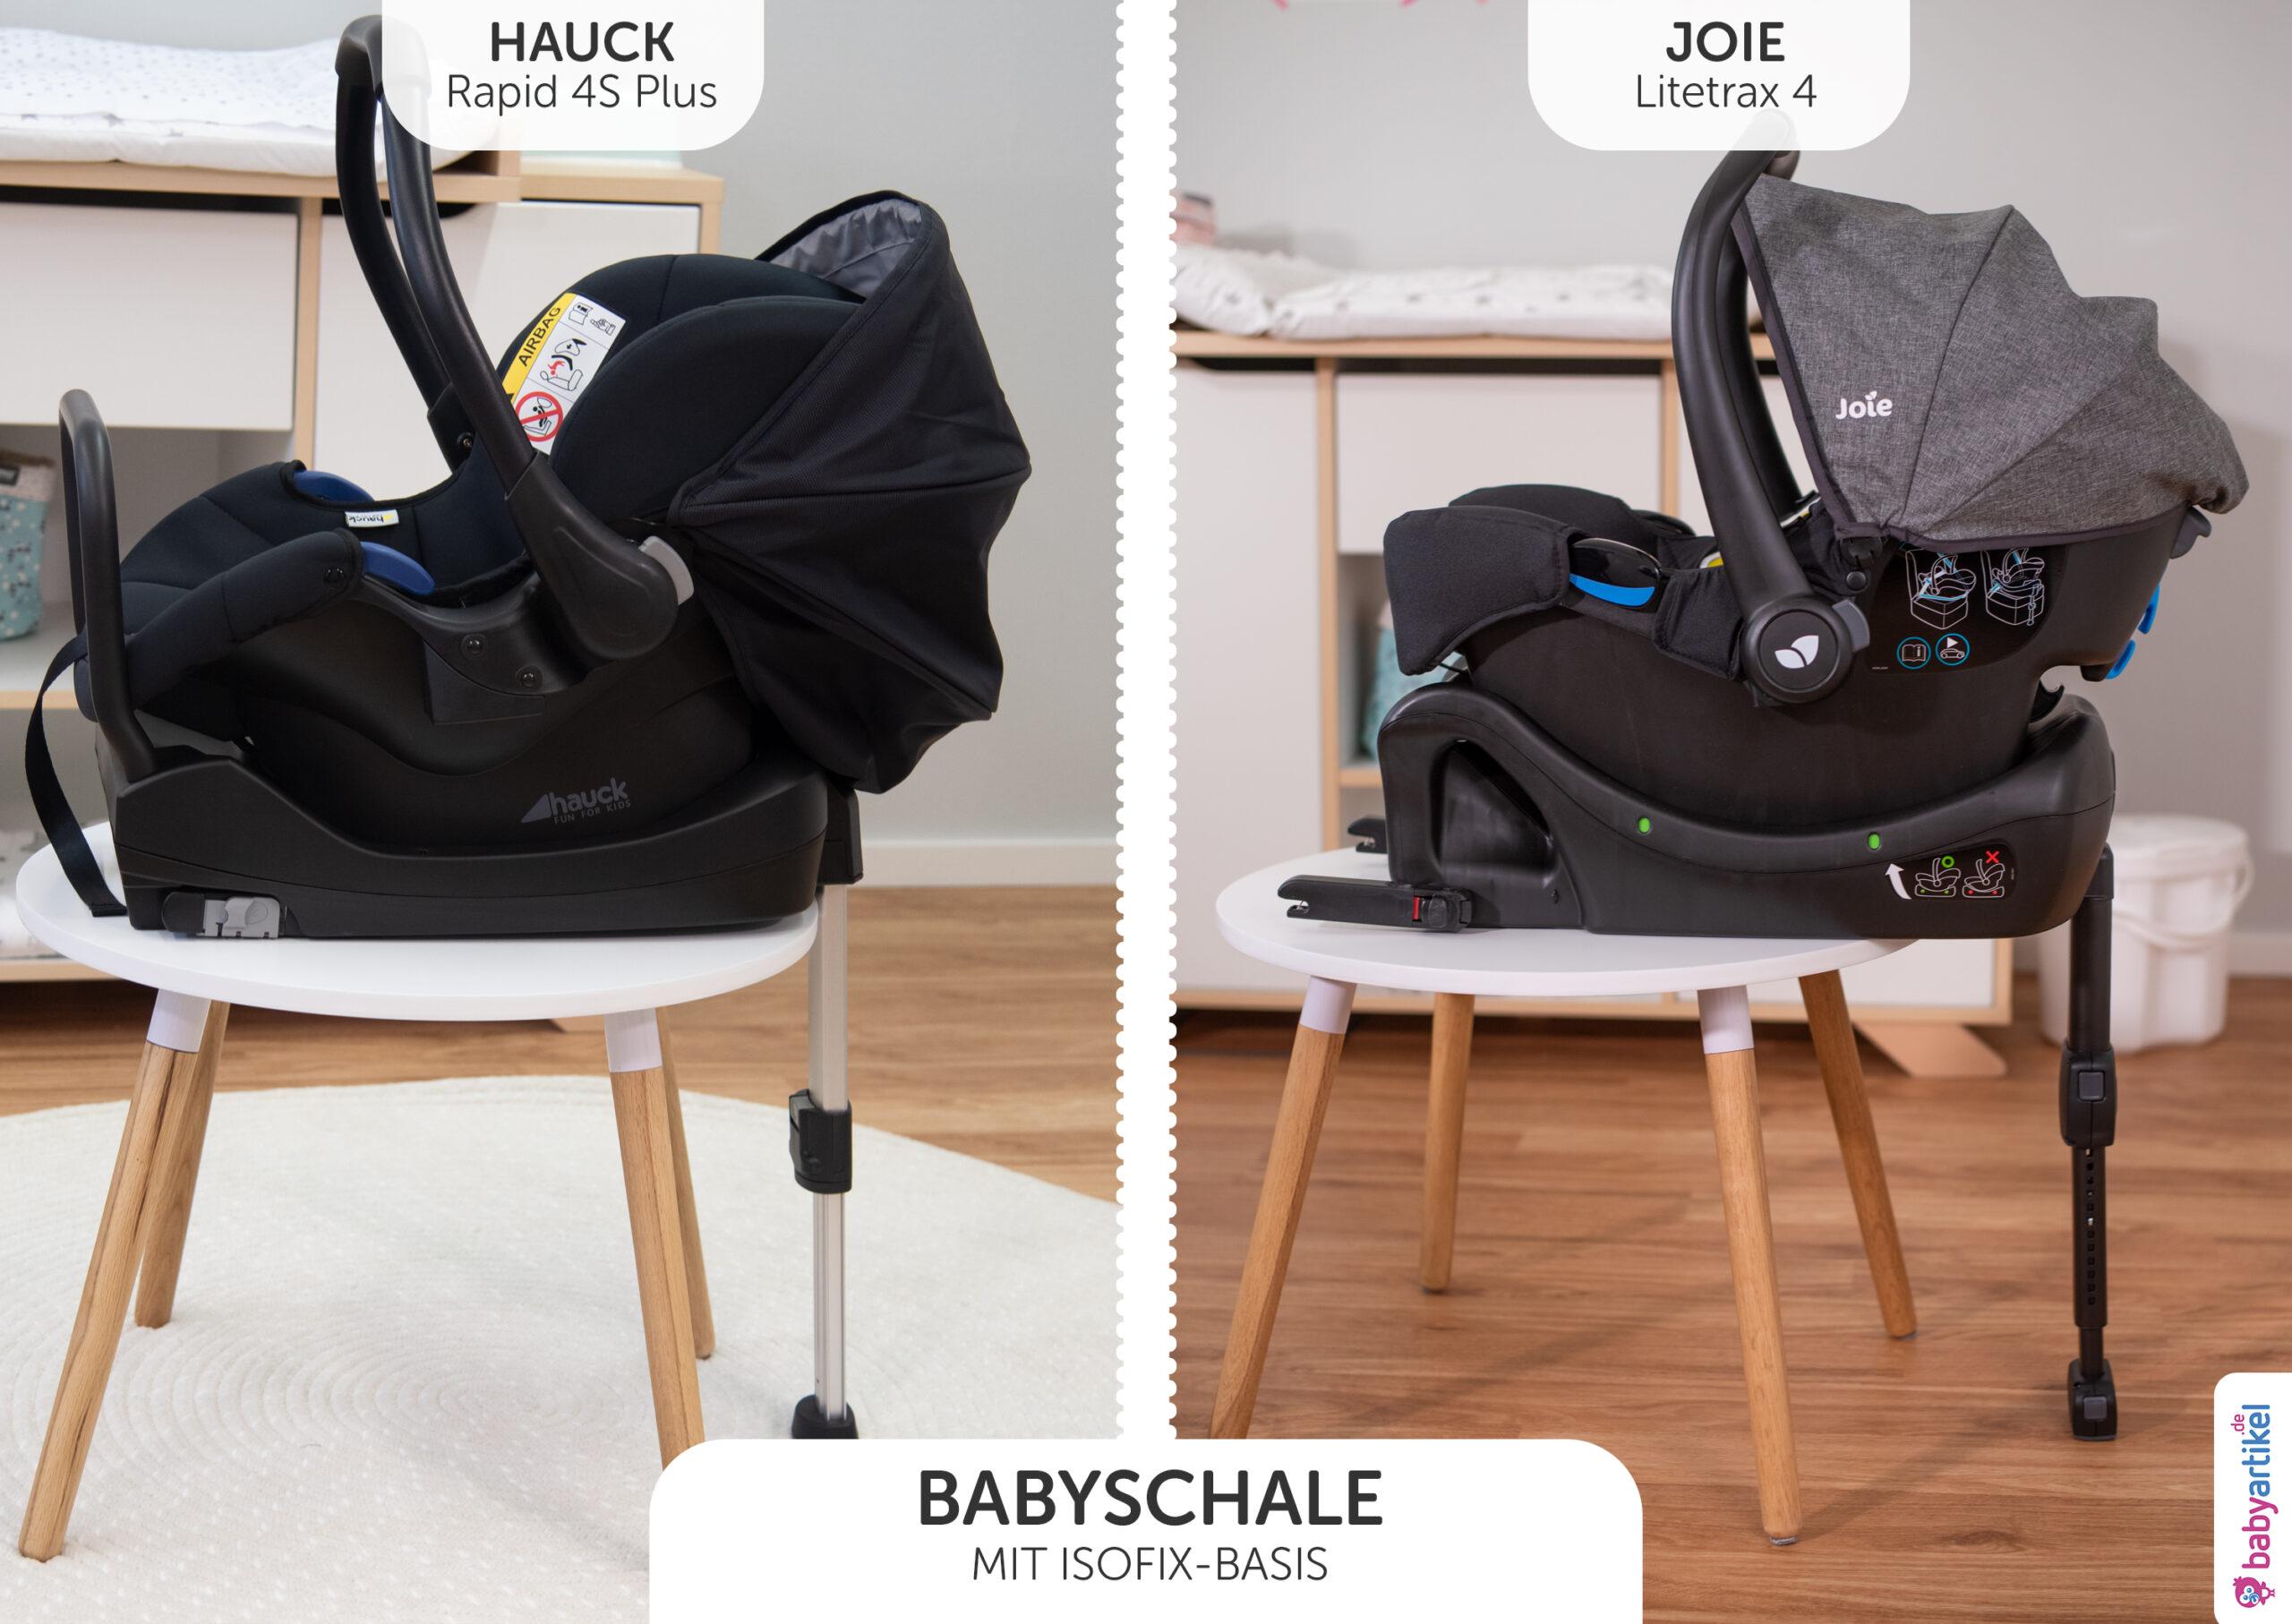 babyschale mit Isofix-basis